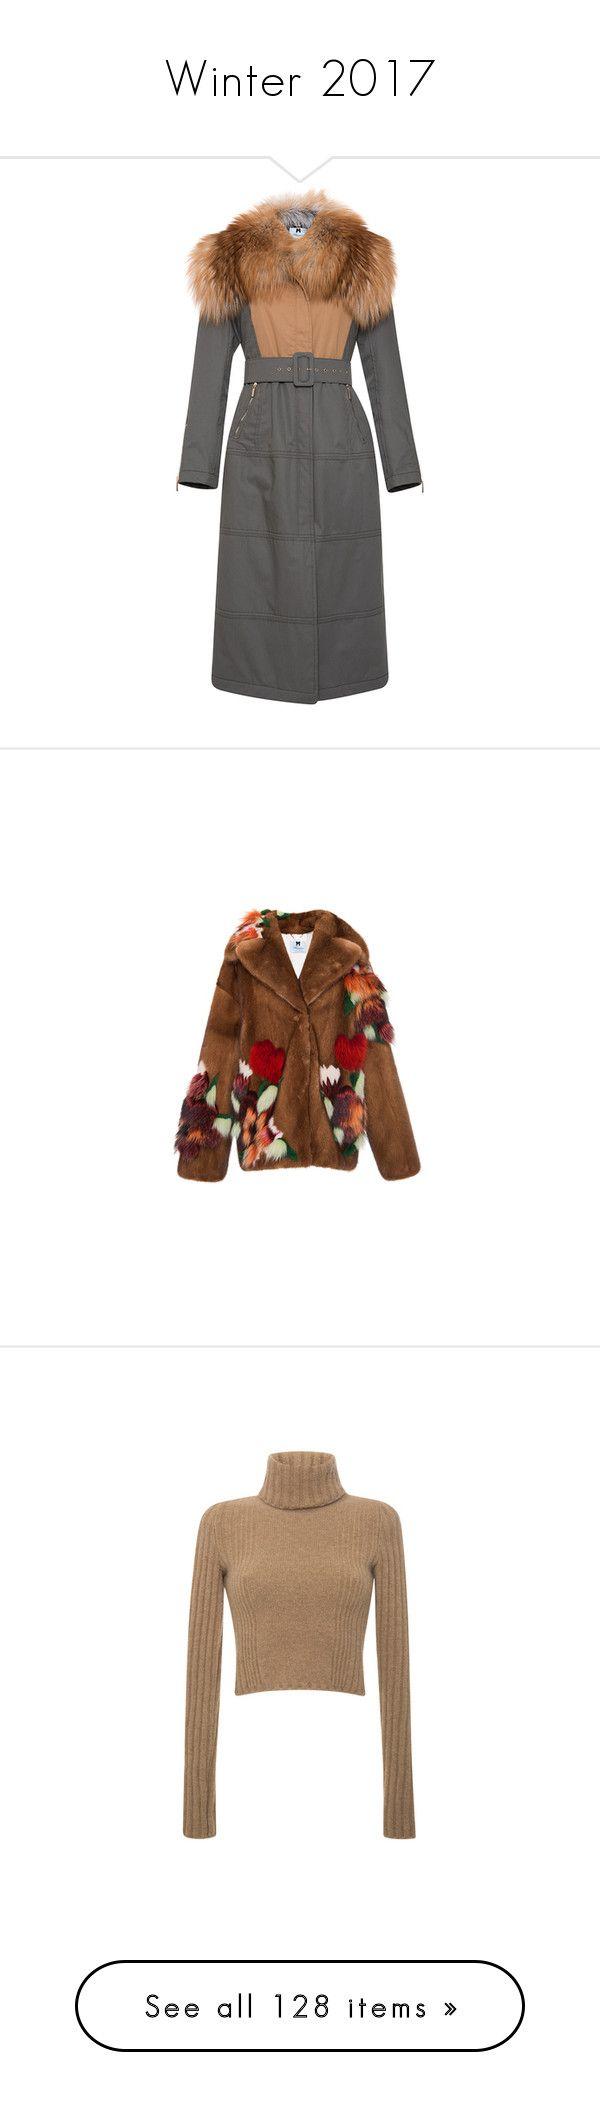 """Winter 2017"" by lorika-borika ❤ liked on Polyvore featuring outerwear, coats, blumarine, fur, coat with belt, belted coat, belt coat, safari coat, floral coat and brown coat"